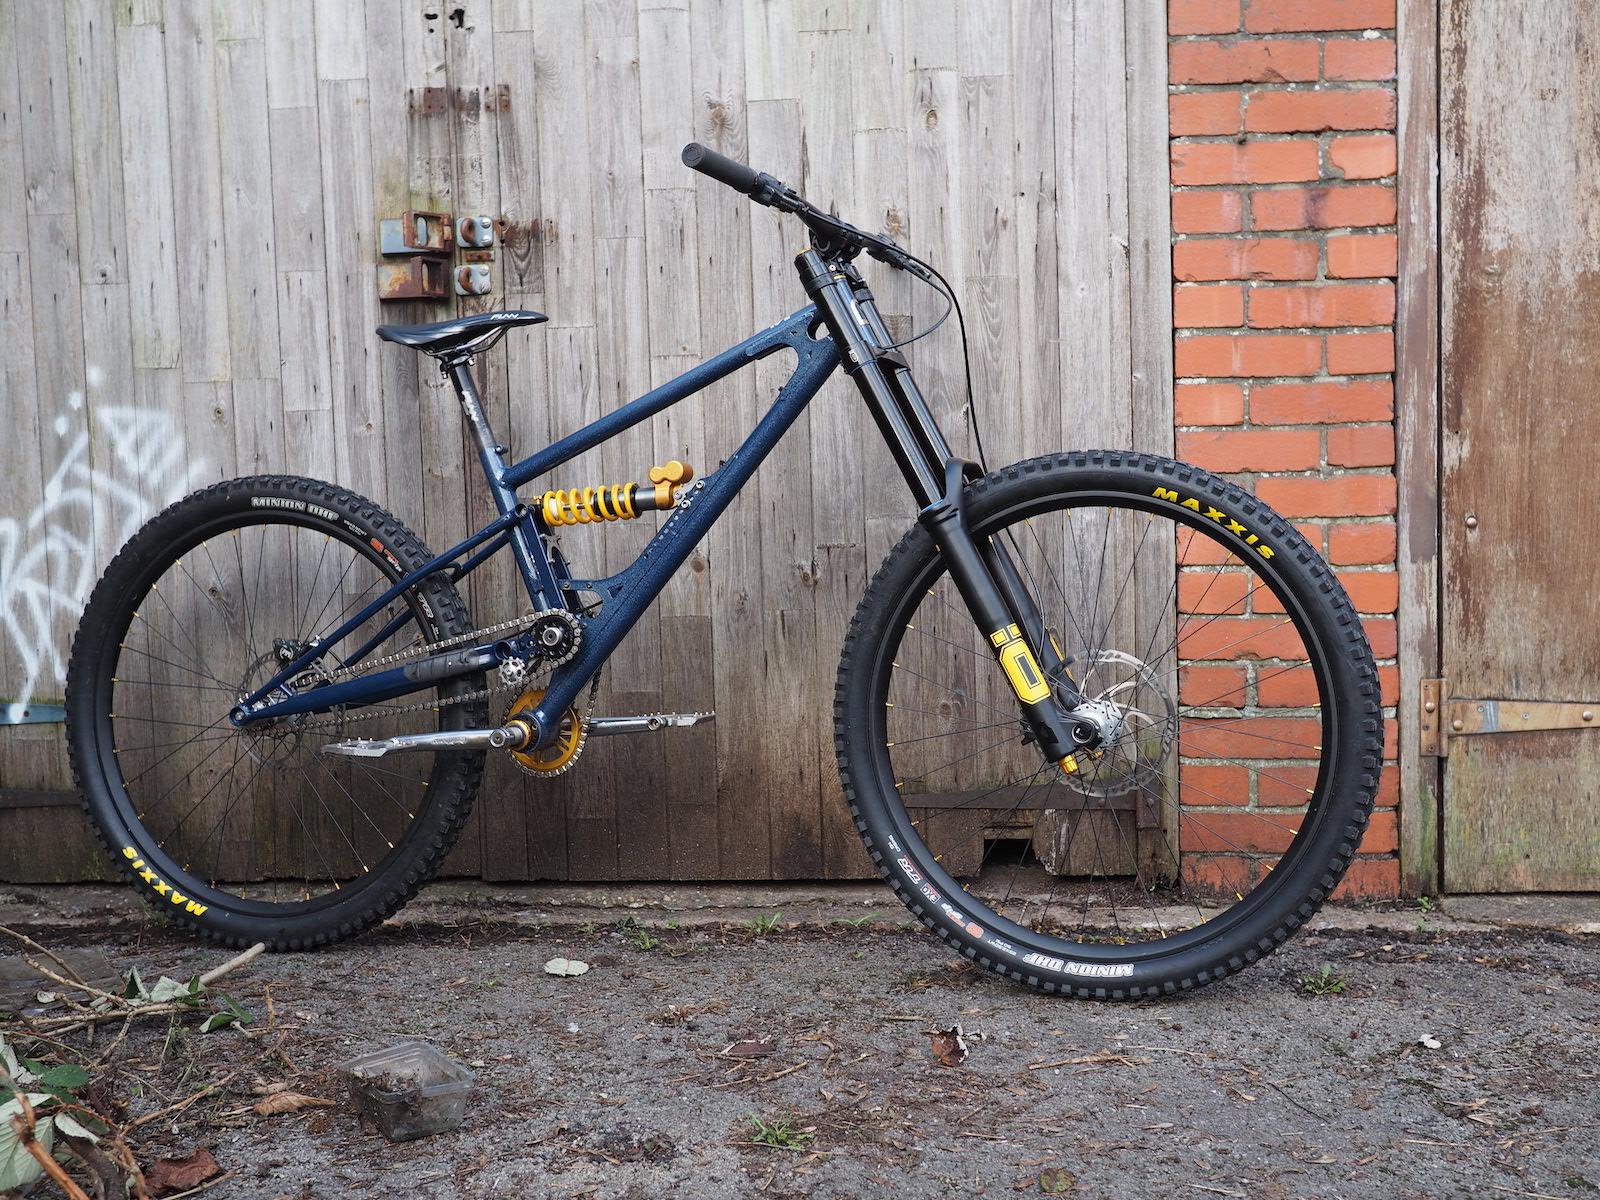 Starling-Cycles-Sturn-DH-Bike-Complete_2890.jpg